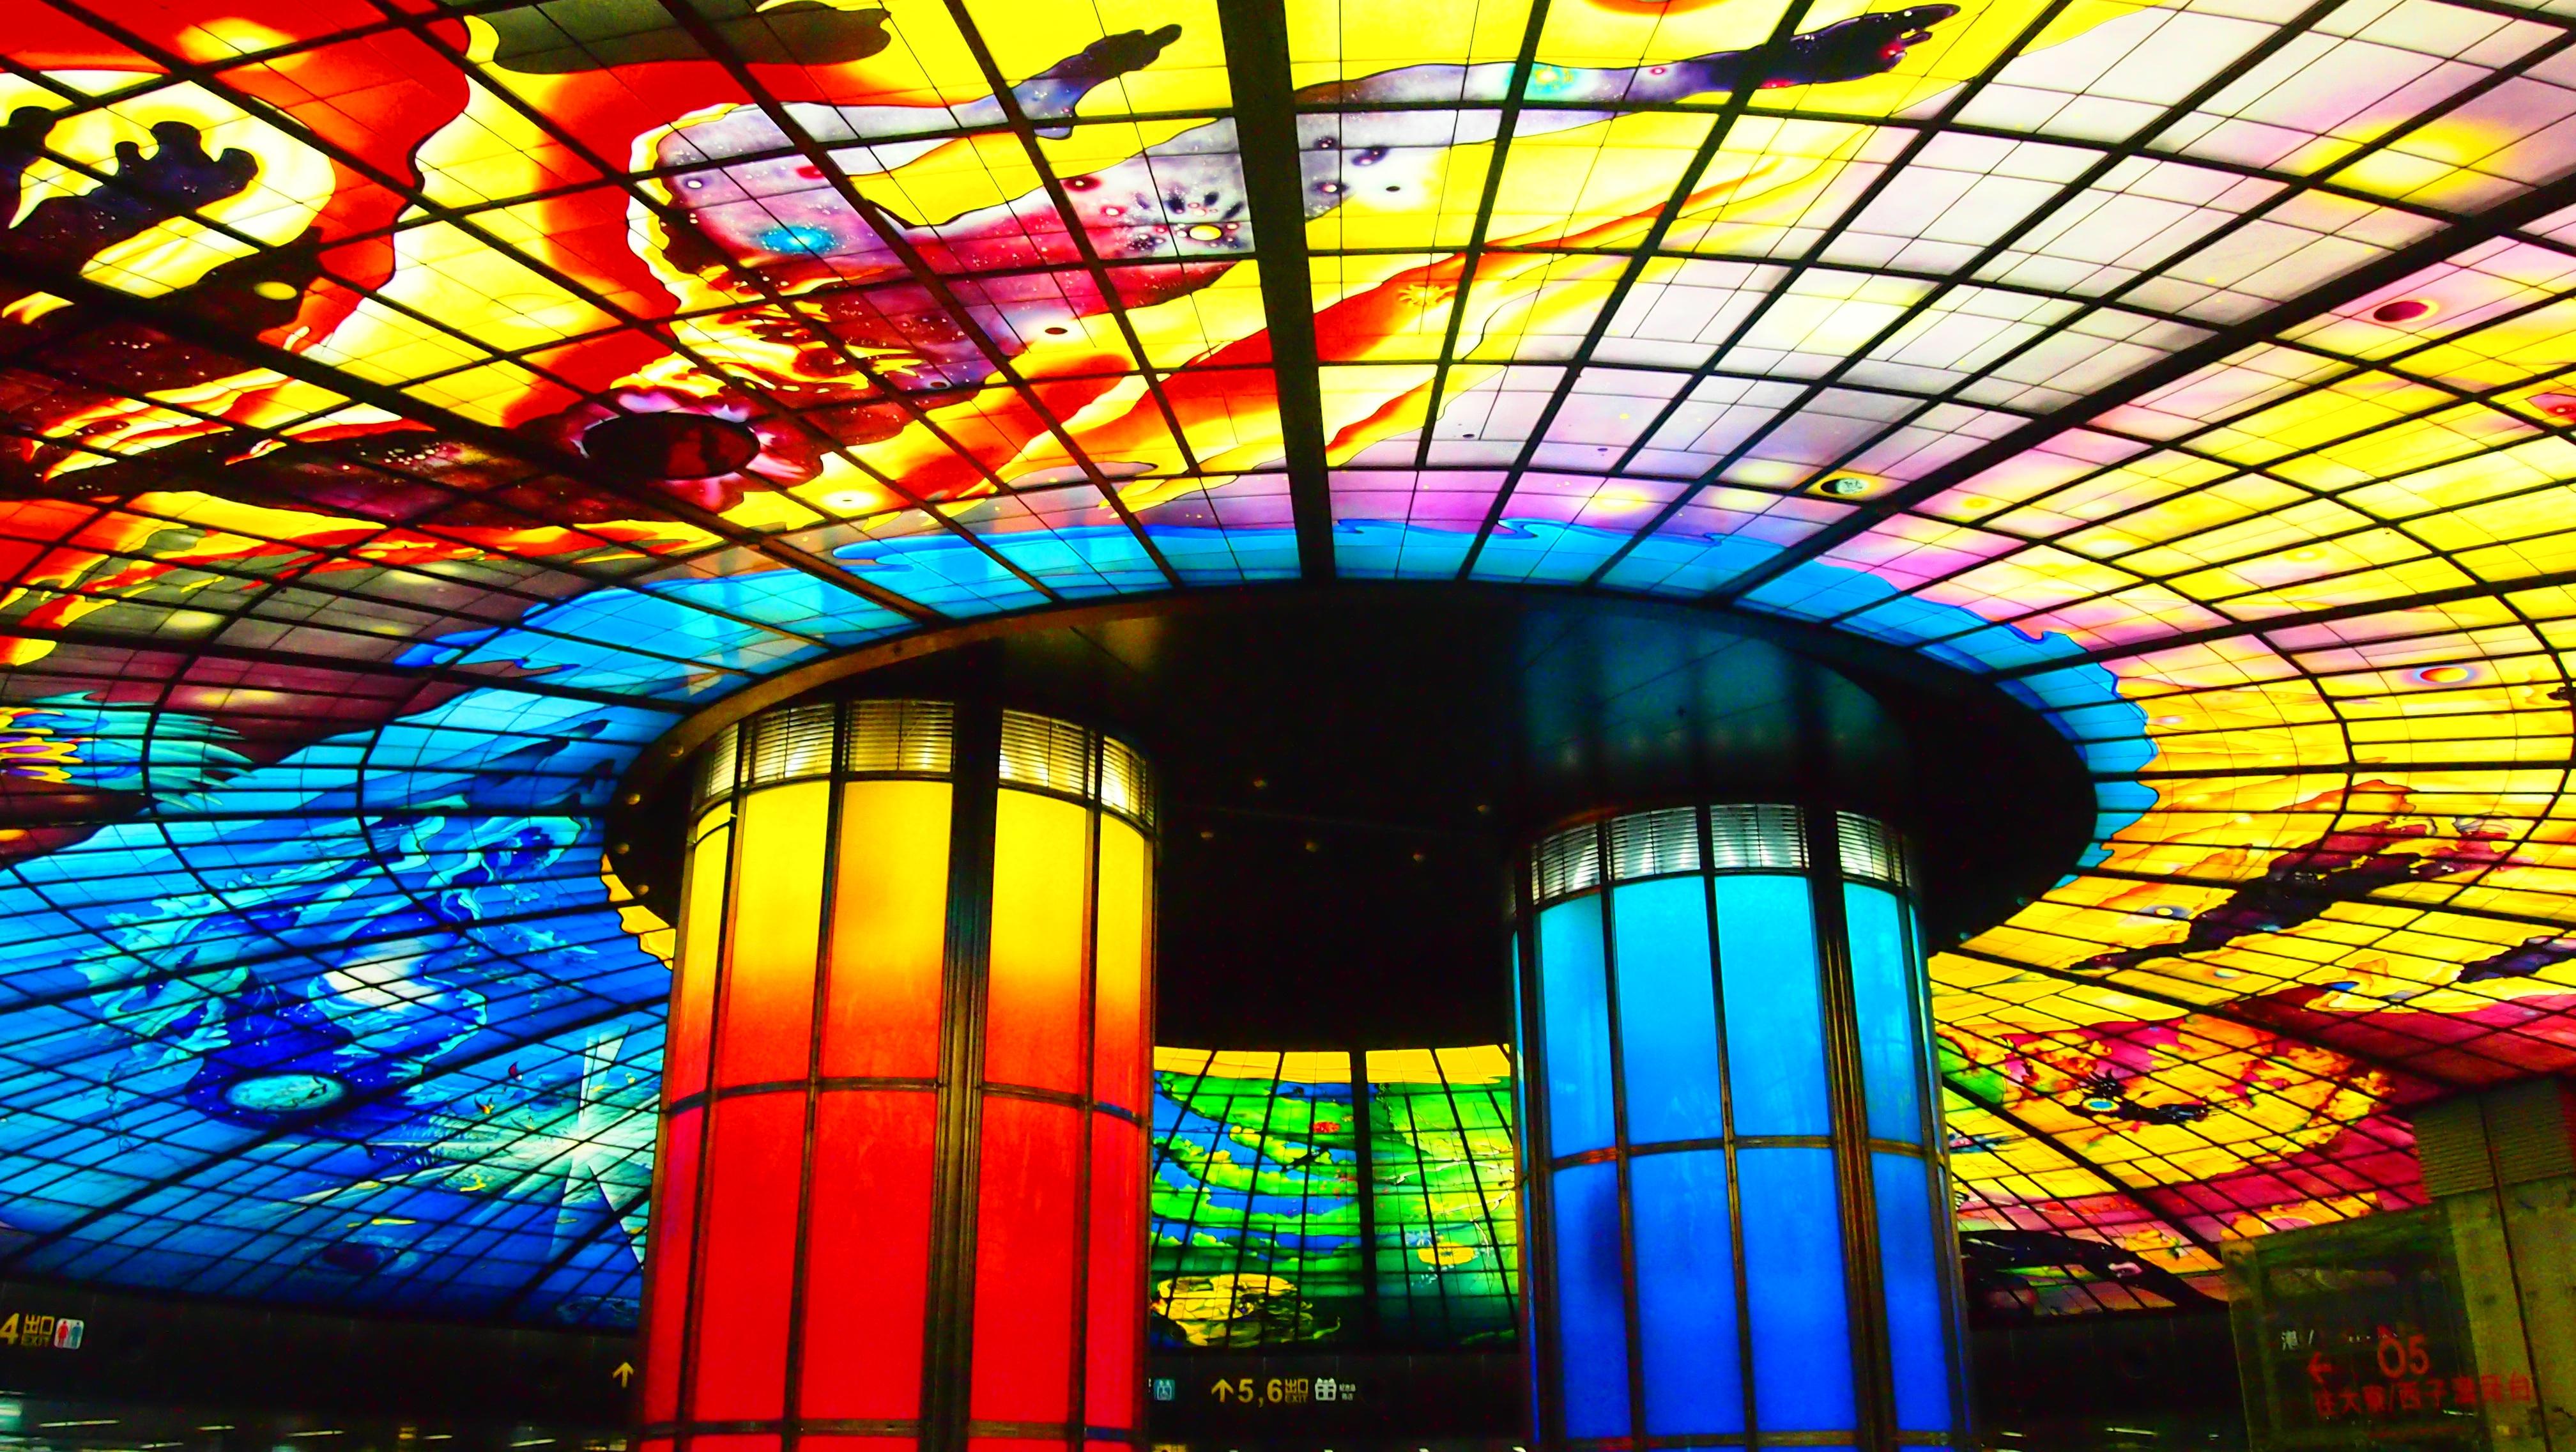 Fotoğraf Pencere Bardak Dekorasyon Renk Malzeme Vitray Metro